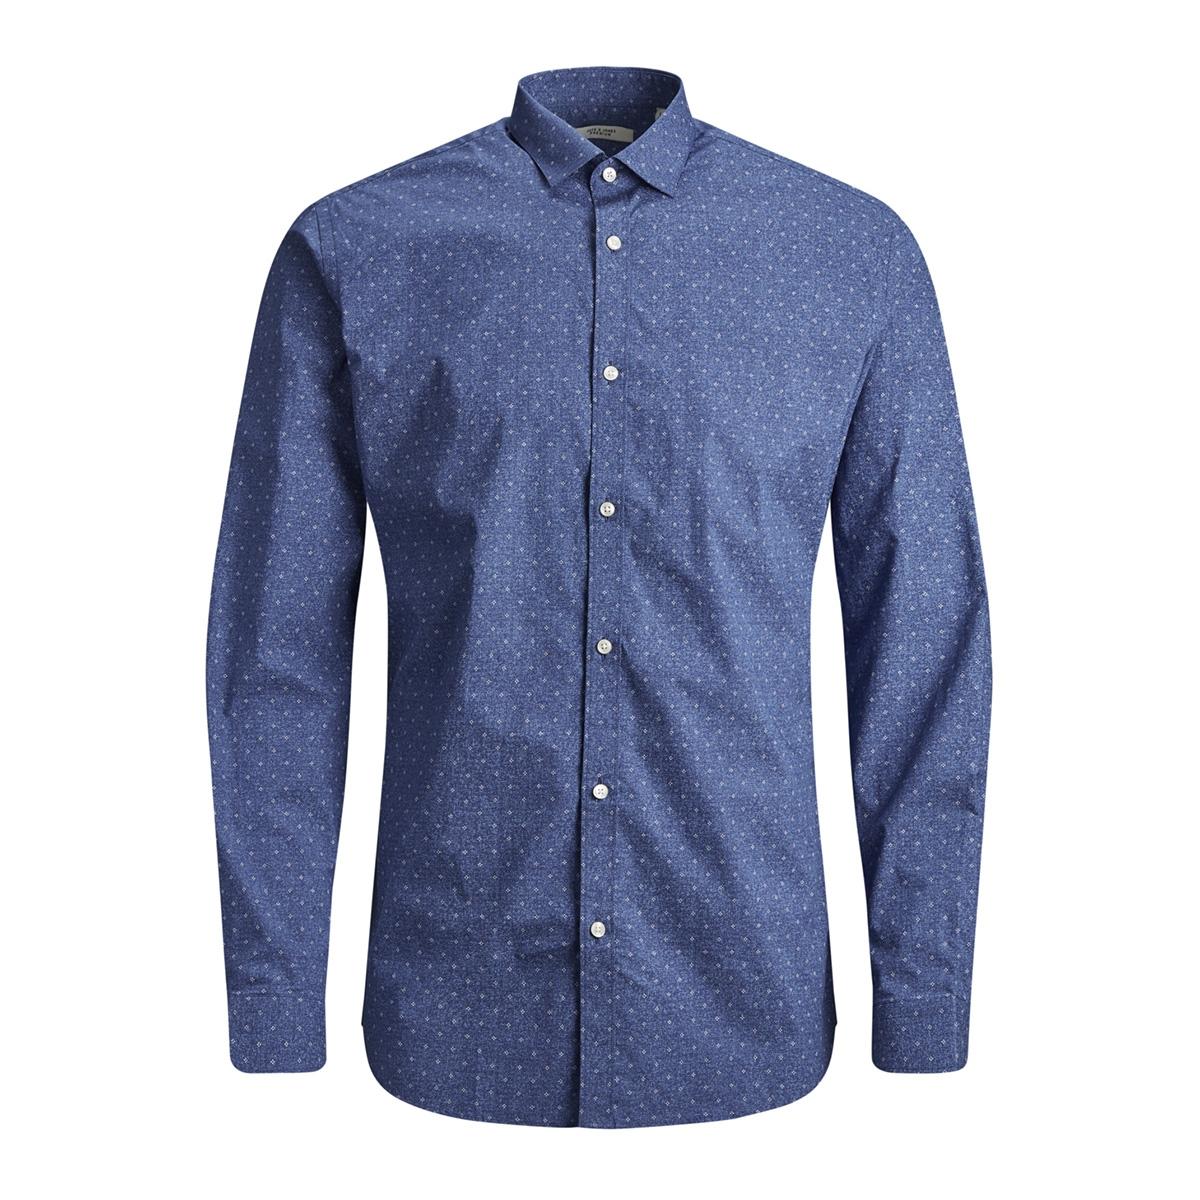 jprblackpool shirt l/s s19 sts 12145540 jack & jones overhemd blue depths/slim fit